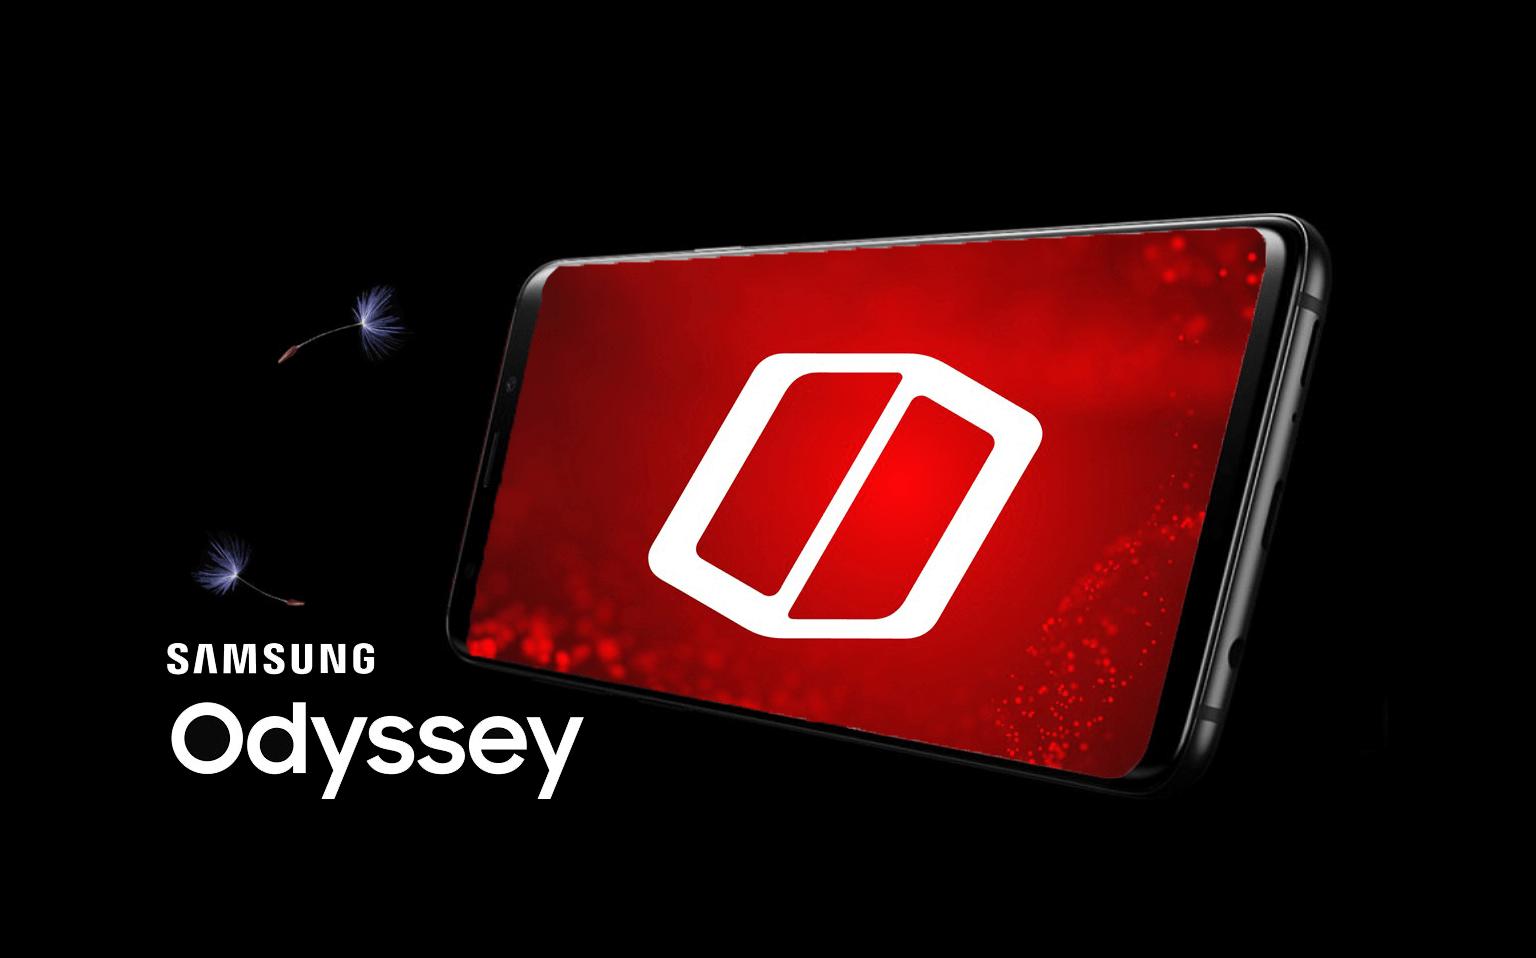 Samsung galaxy odyssey smartphone gamer